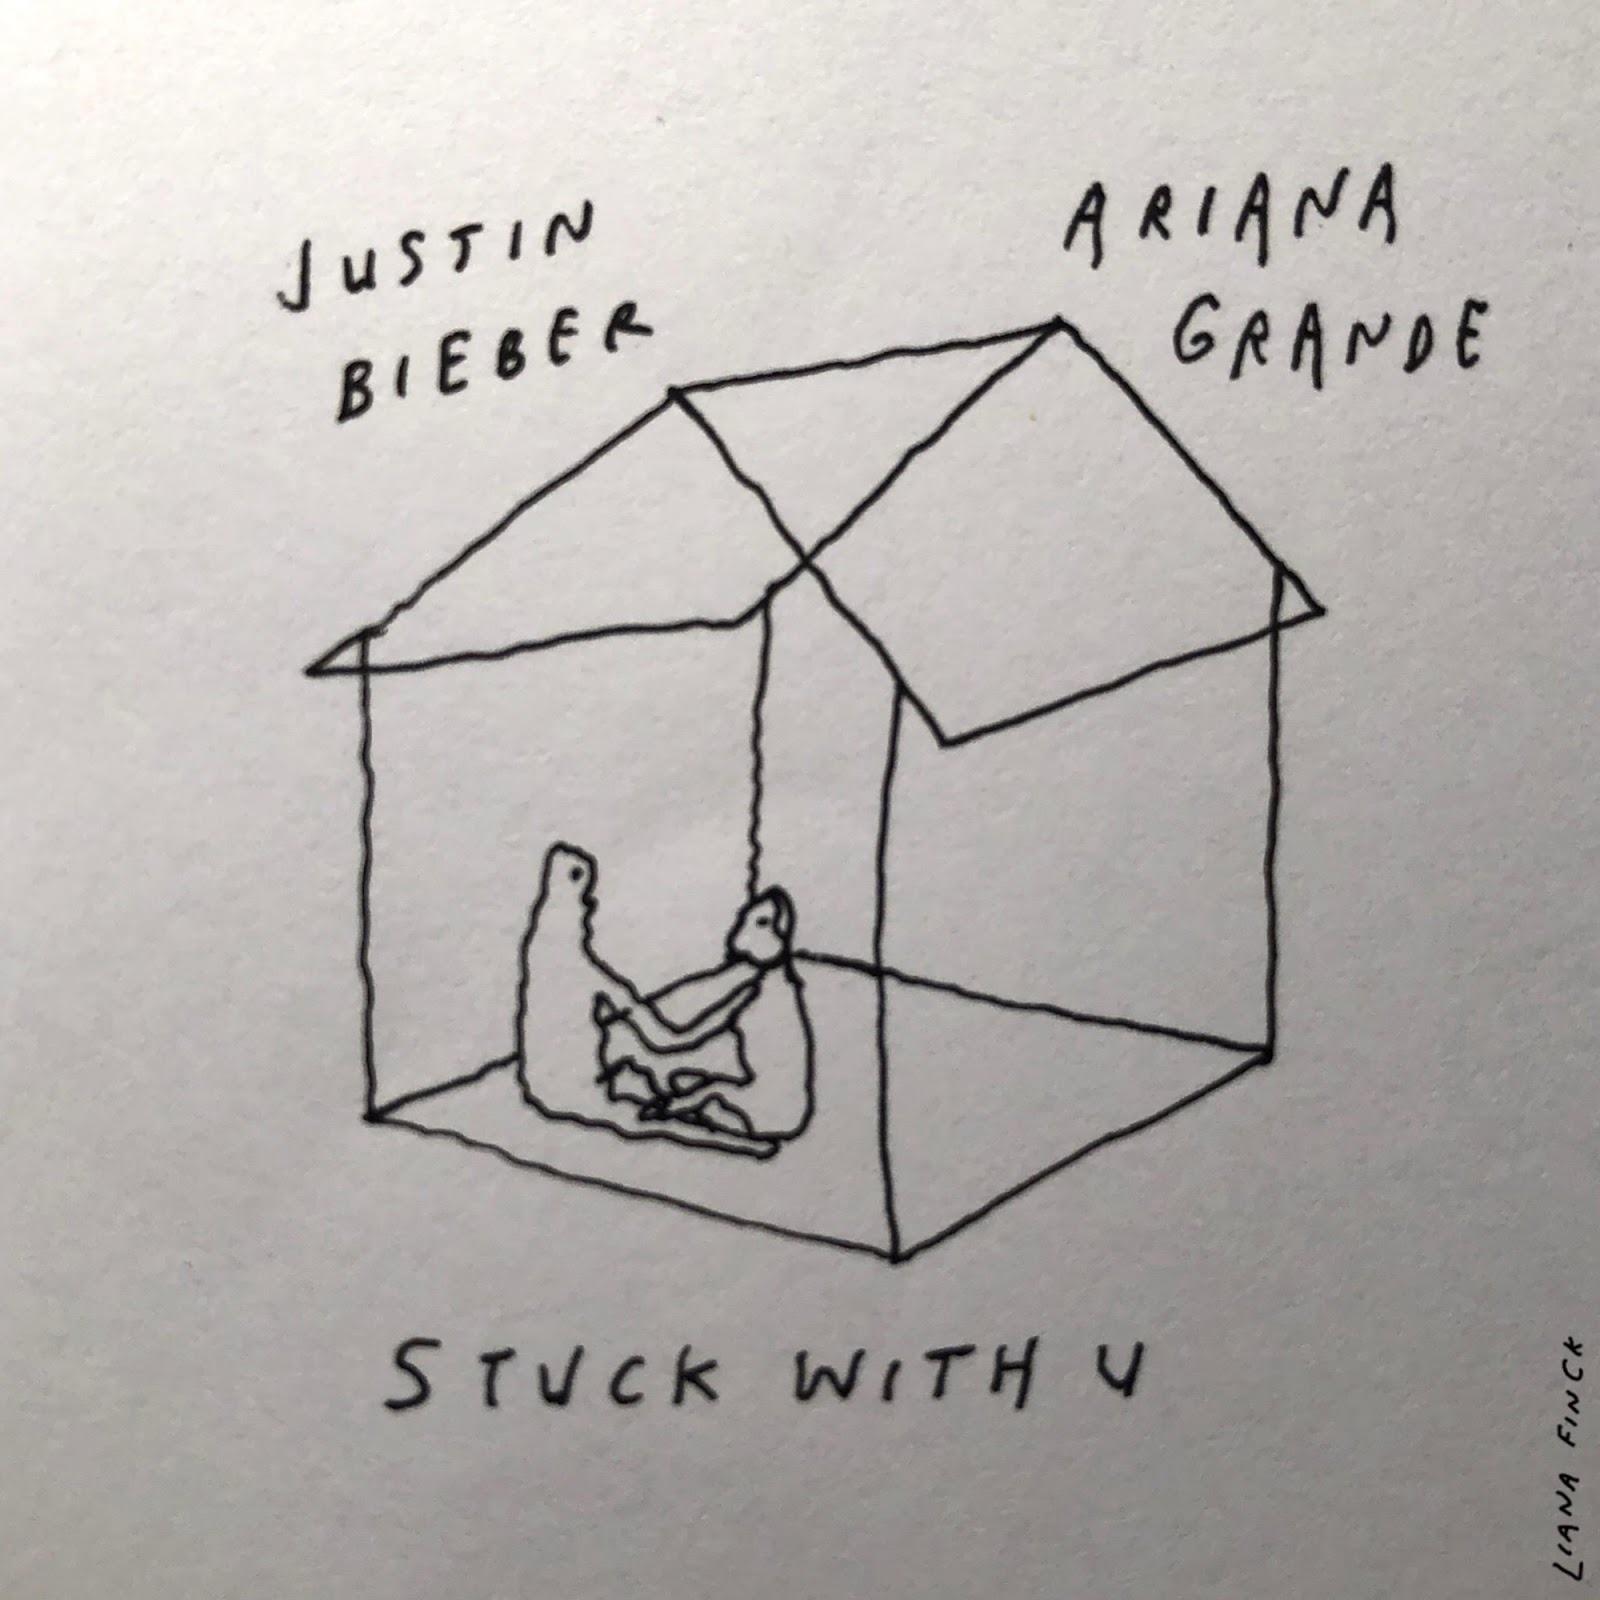 Ariana Grande x Justin Bieber – Stuck with U